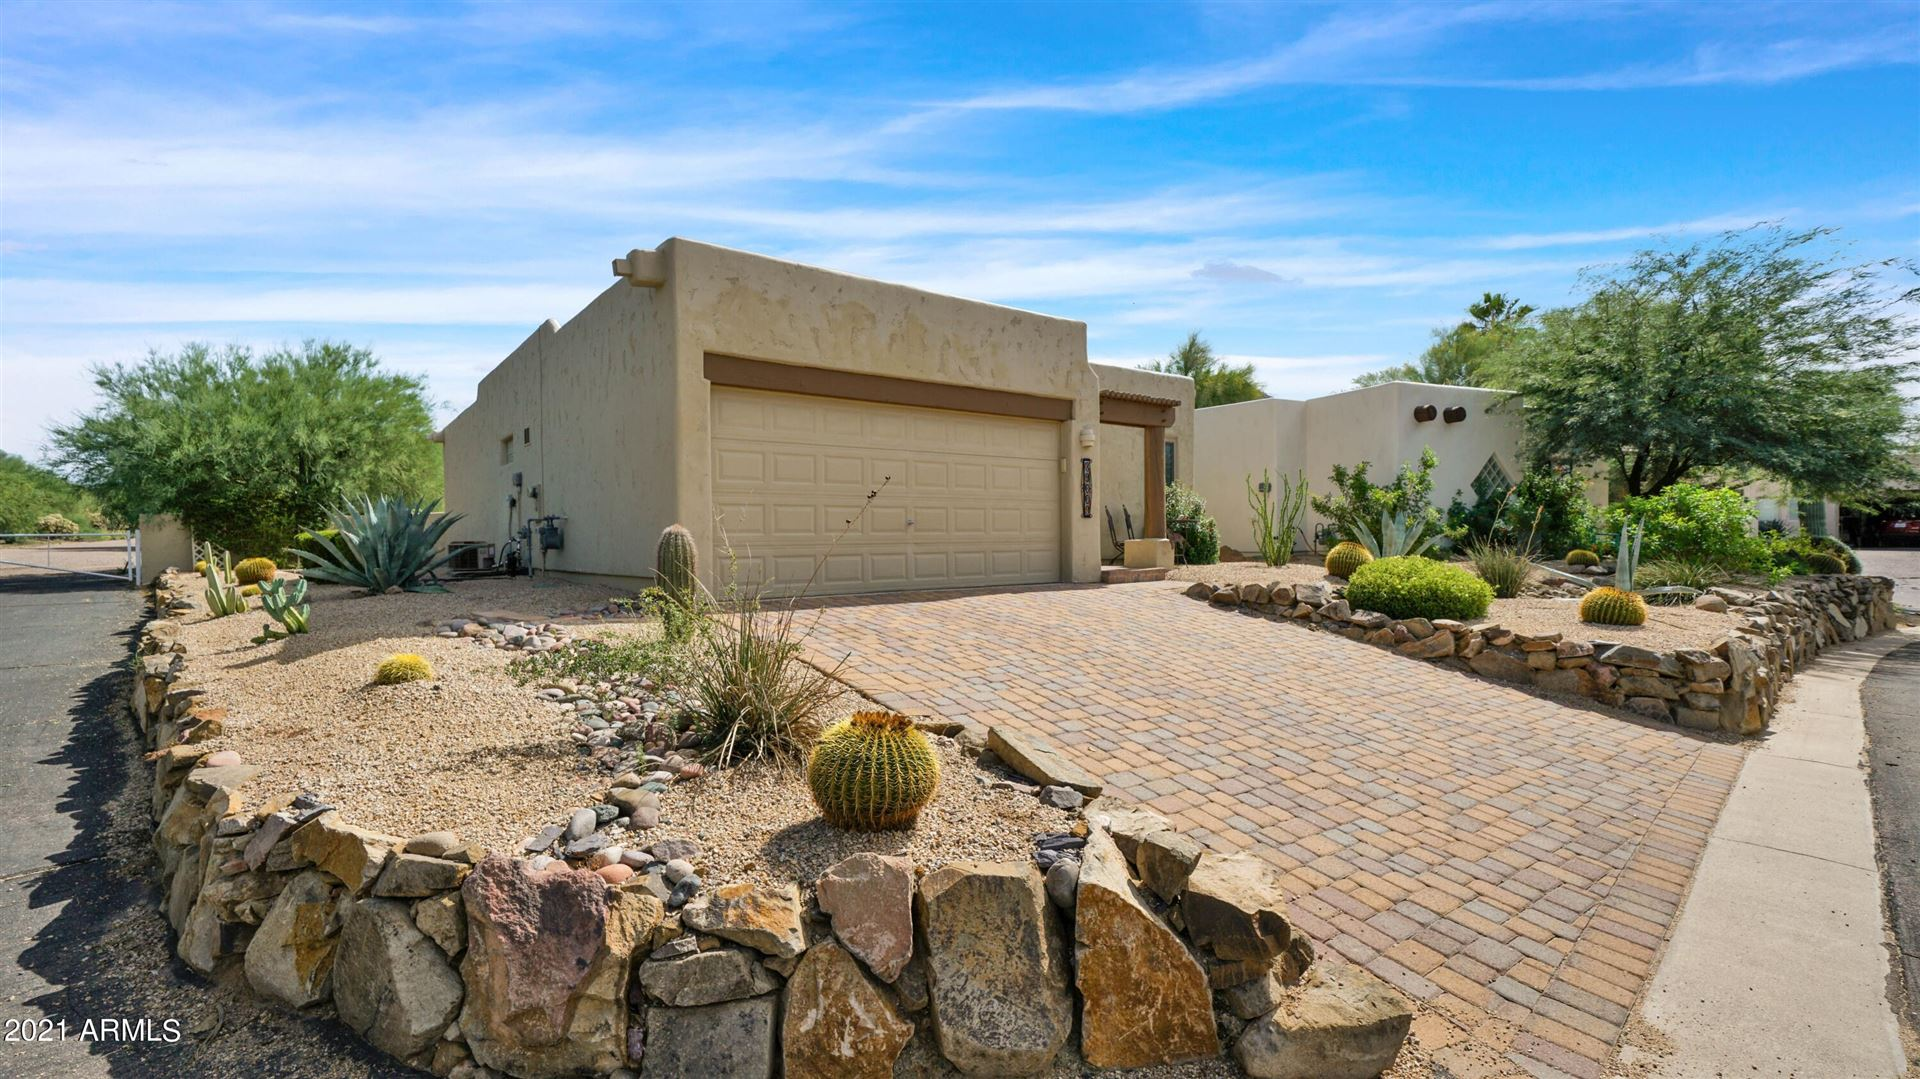 Photo of 39009 N HABITAT Circle, Cave Creek, AZ 85331 (MLS # 6304819)